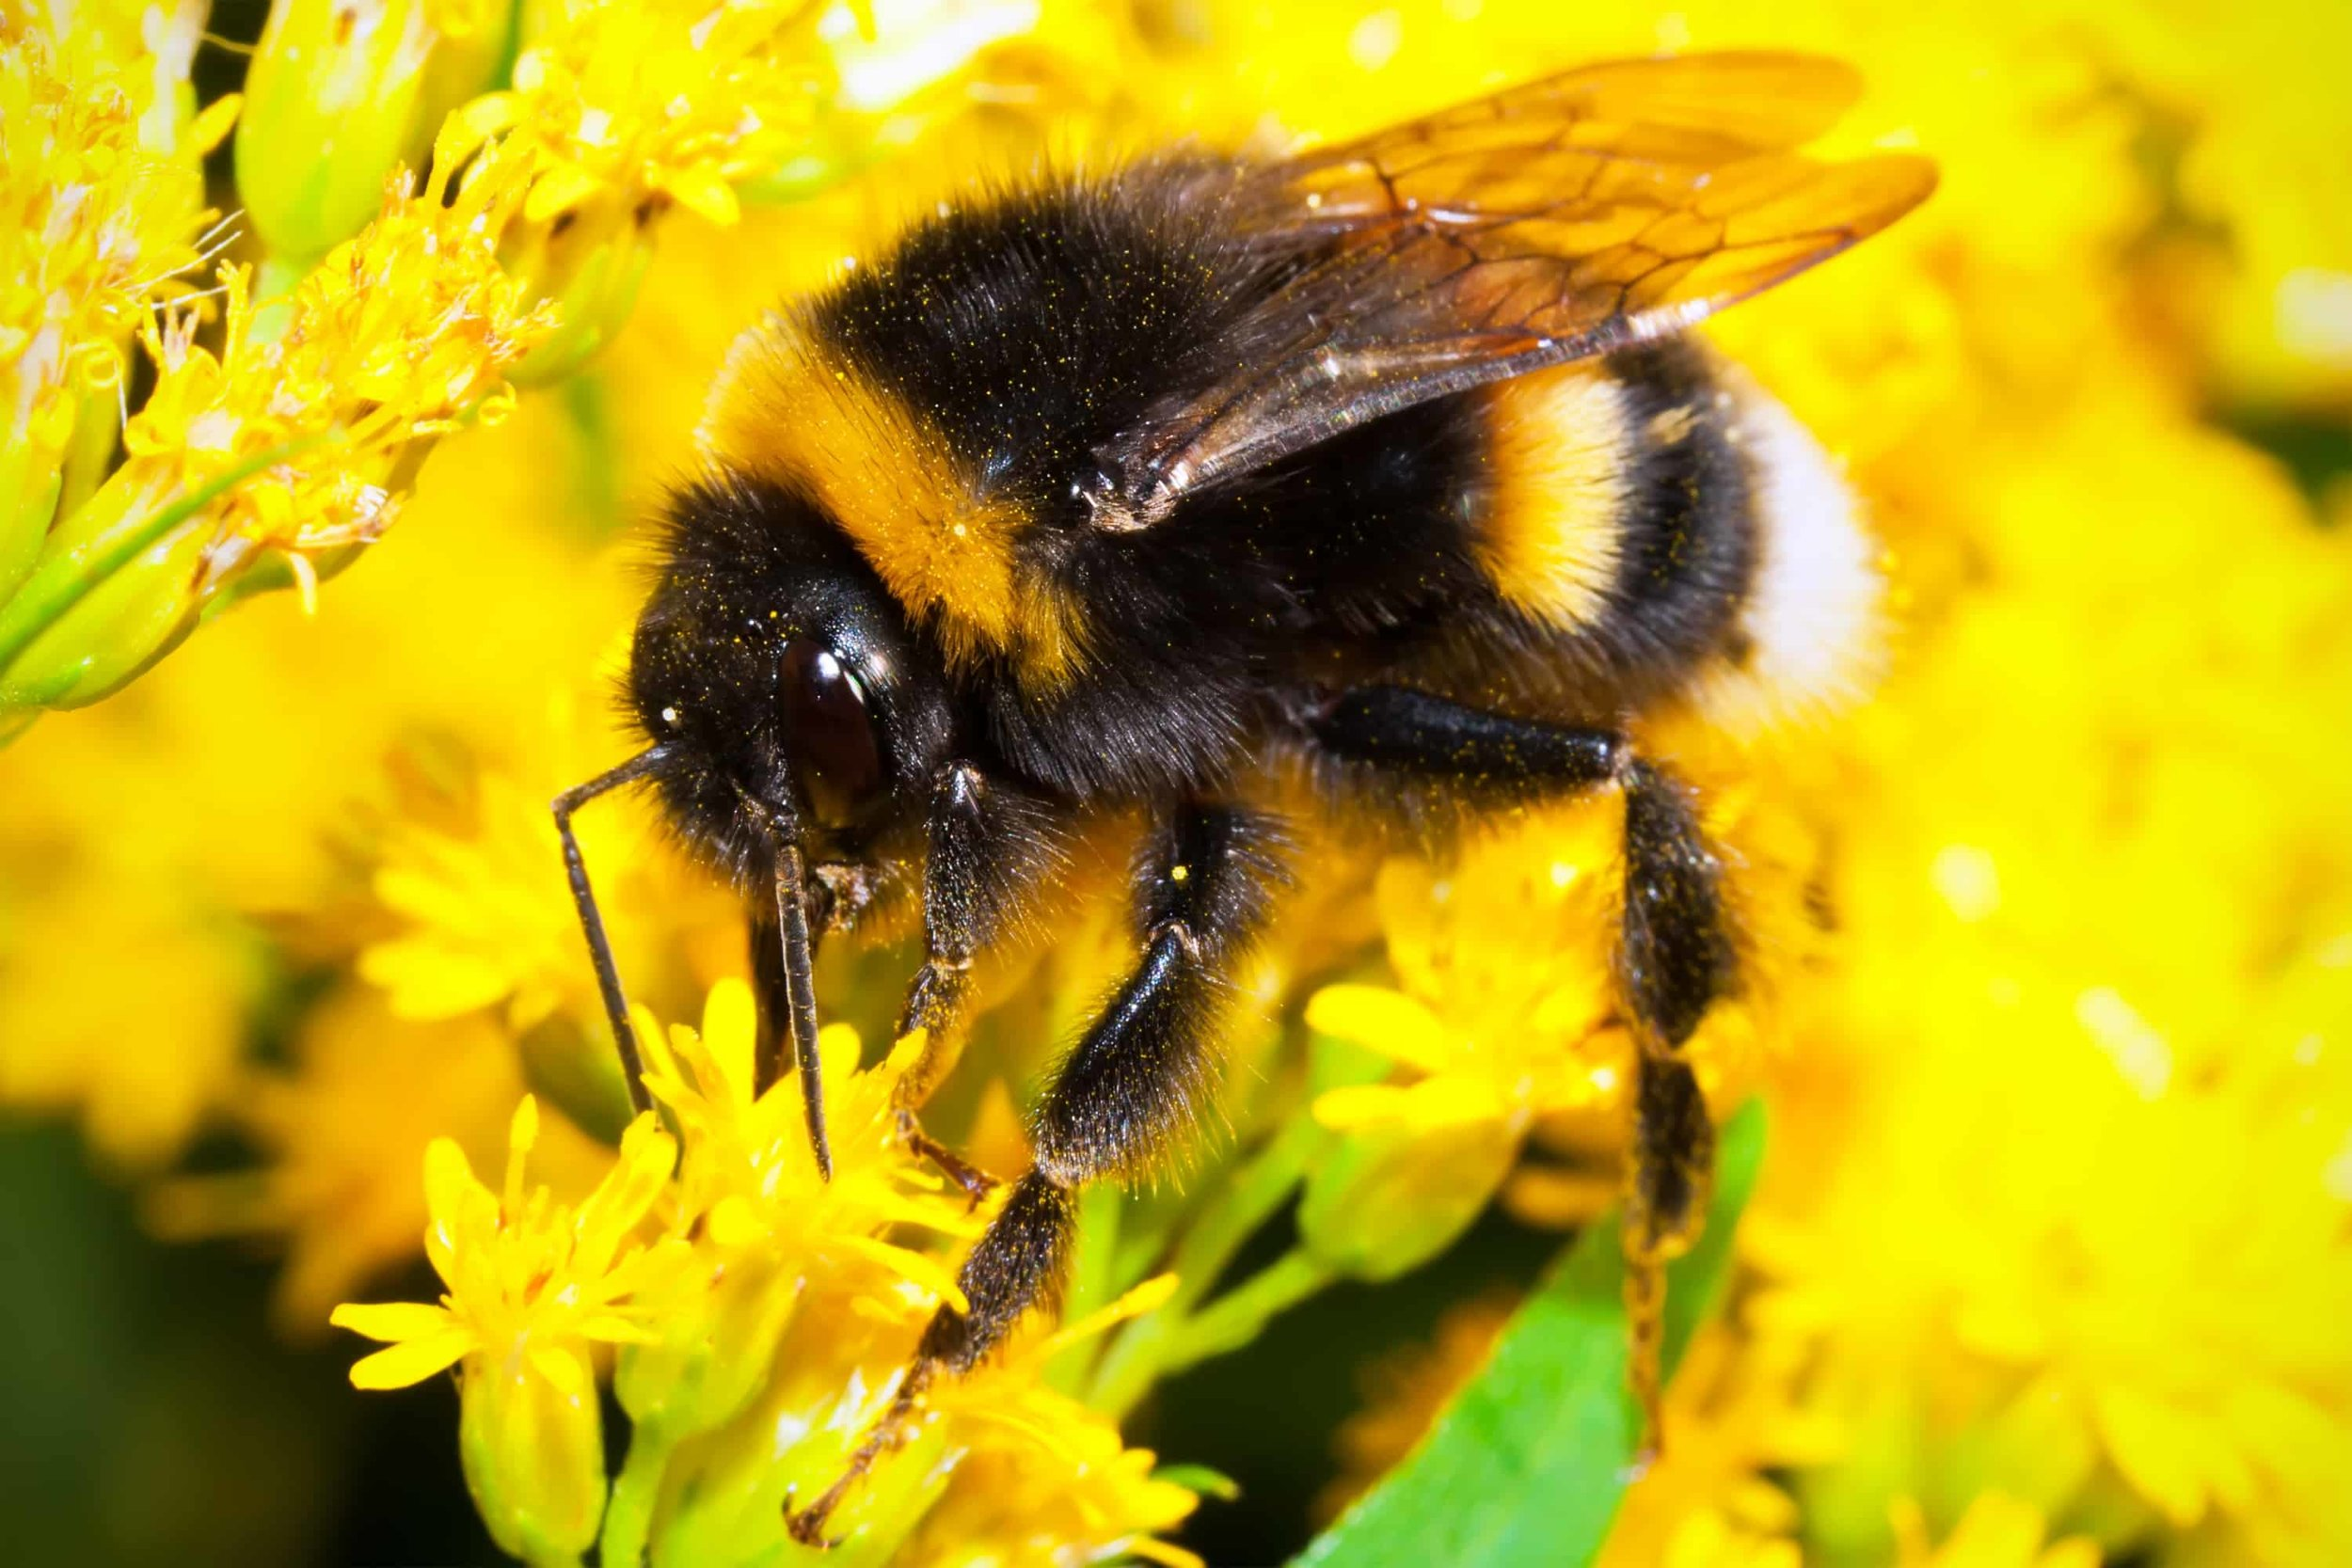 Bumblebees-in-decline.jpg